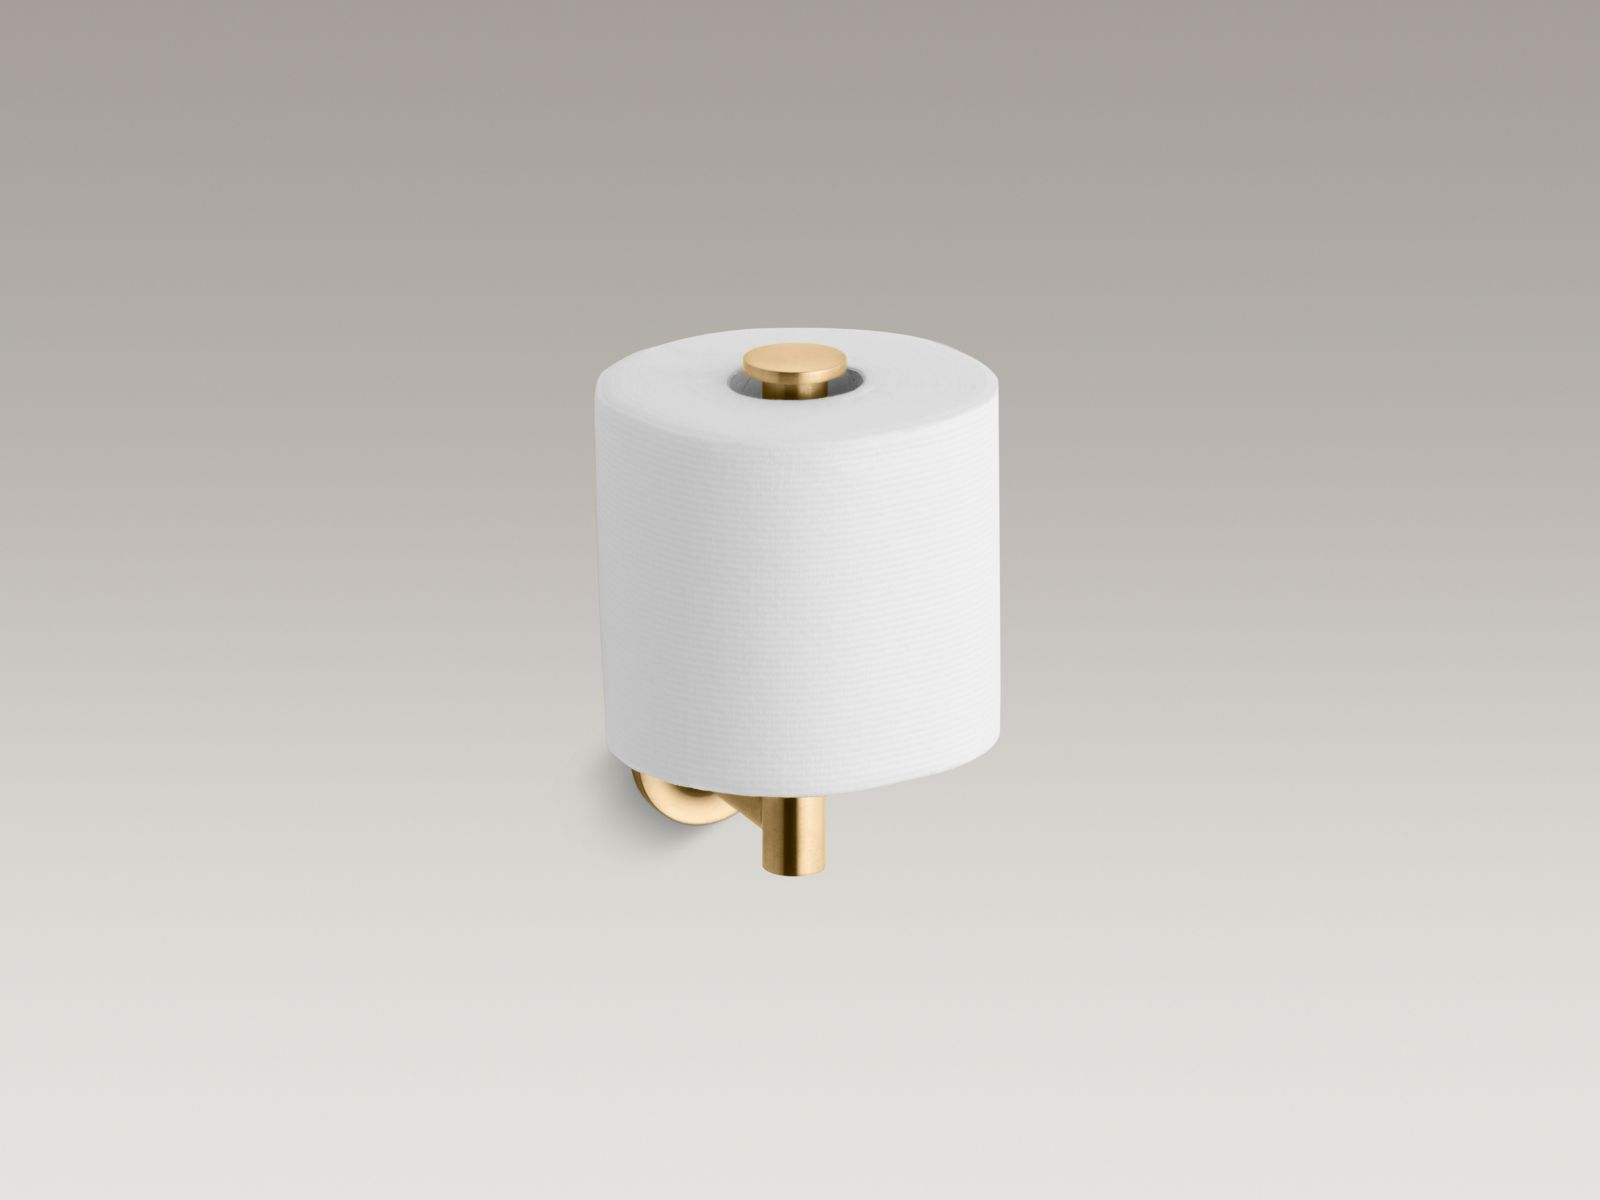 Kohler K-14444-BGD Purist Toilet Tissue Holder Vibrant Moderne Brushed Gold